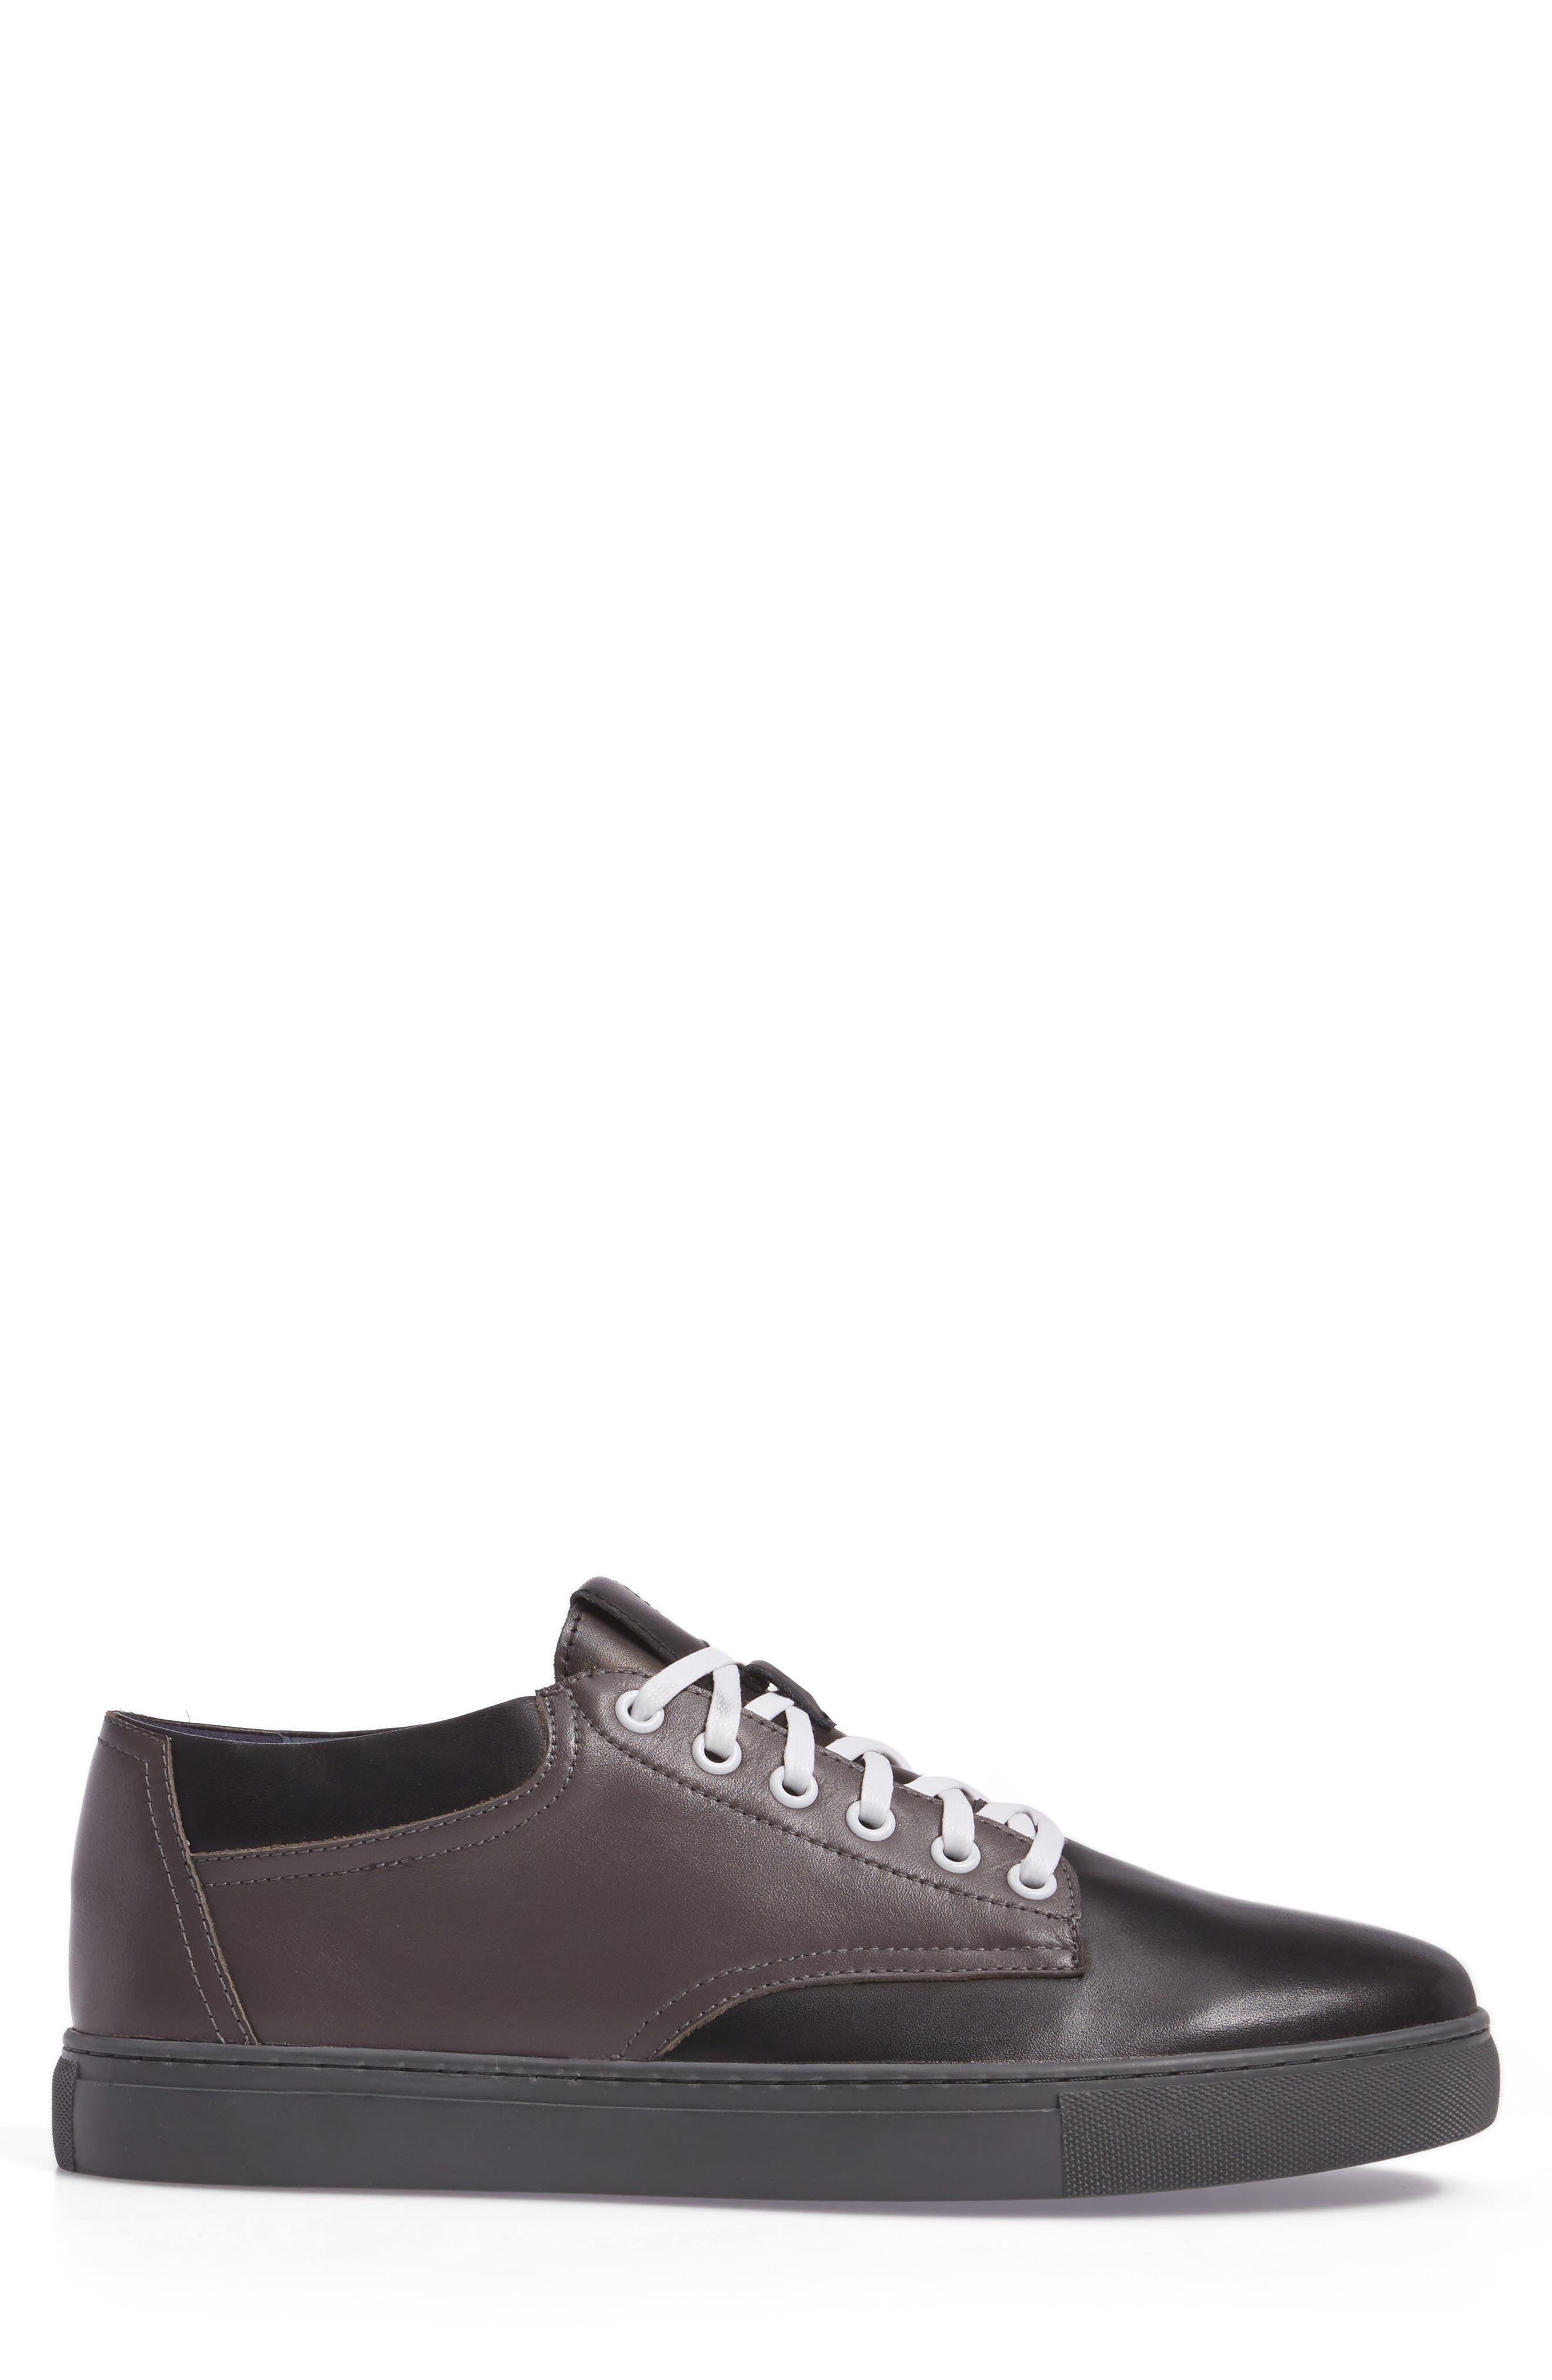 Ralston Sneaker,                             Alternate thumbnail 3, color,                             021